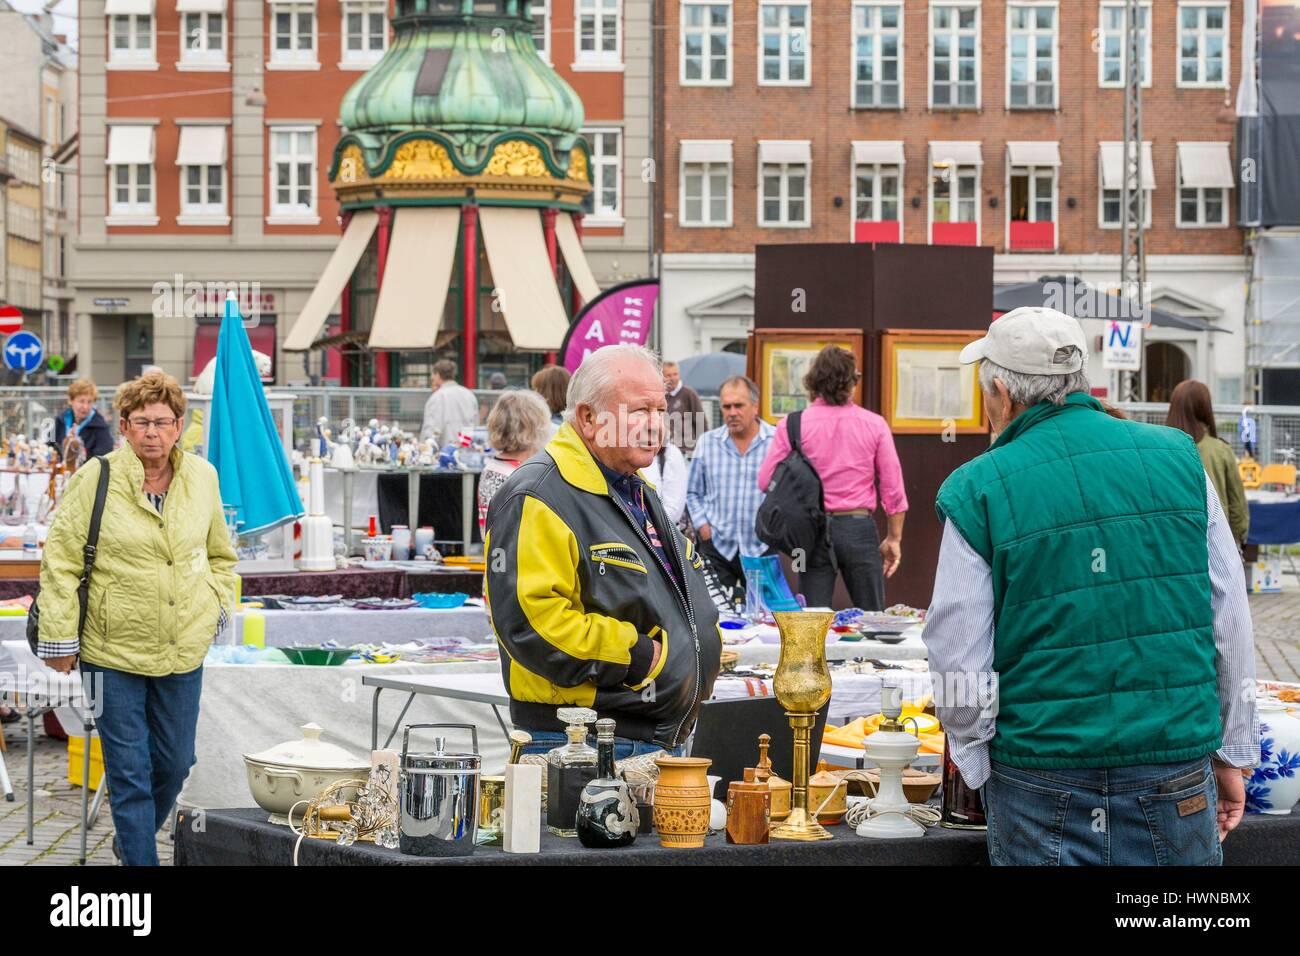 Denmark, Zealand, Copenhagen, Kongens Nytorv, flea market - Stock Image